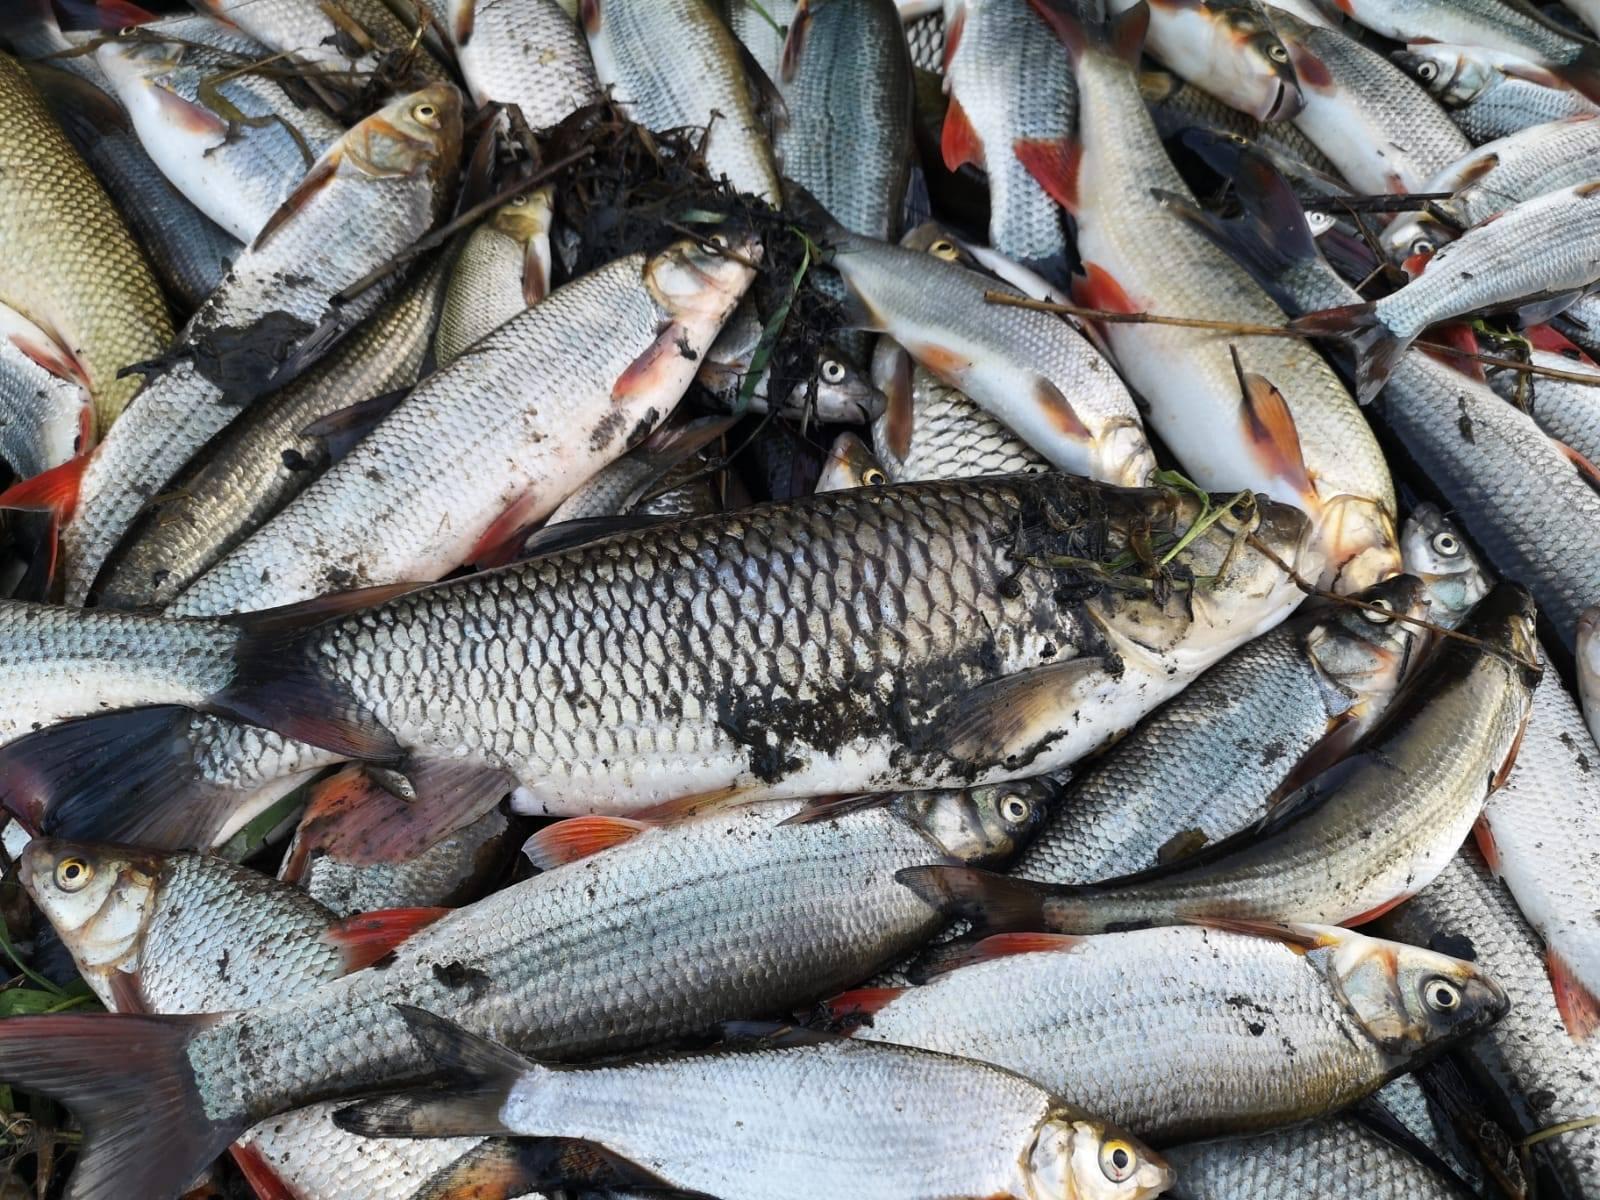 Ryby v Bečvě otrávily kyanidy. Potvrdily to rozbory vody